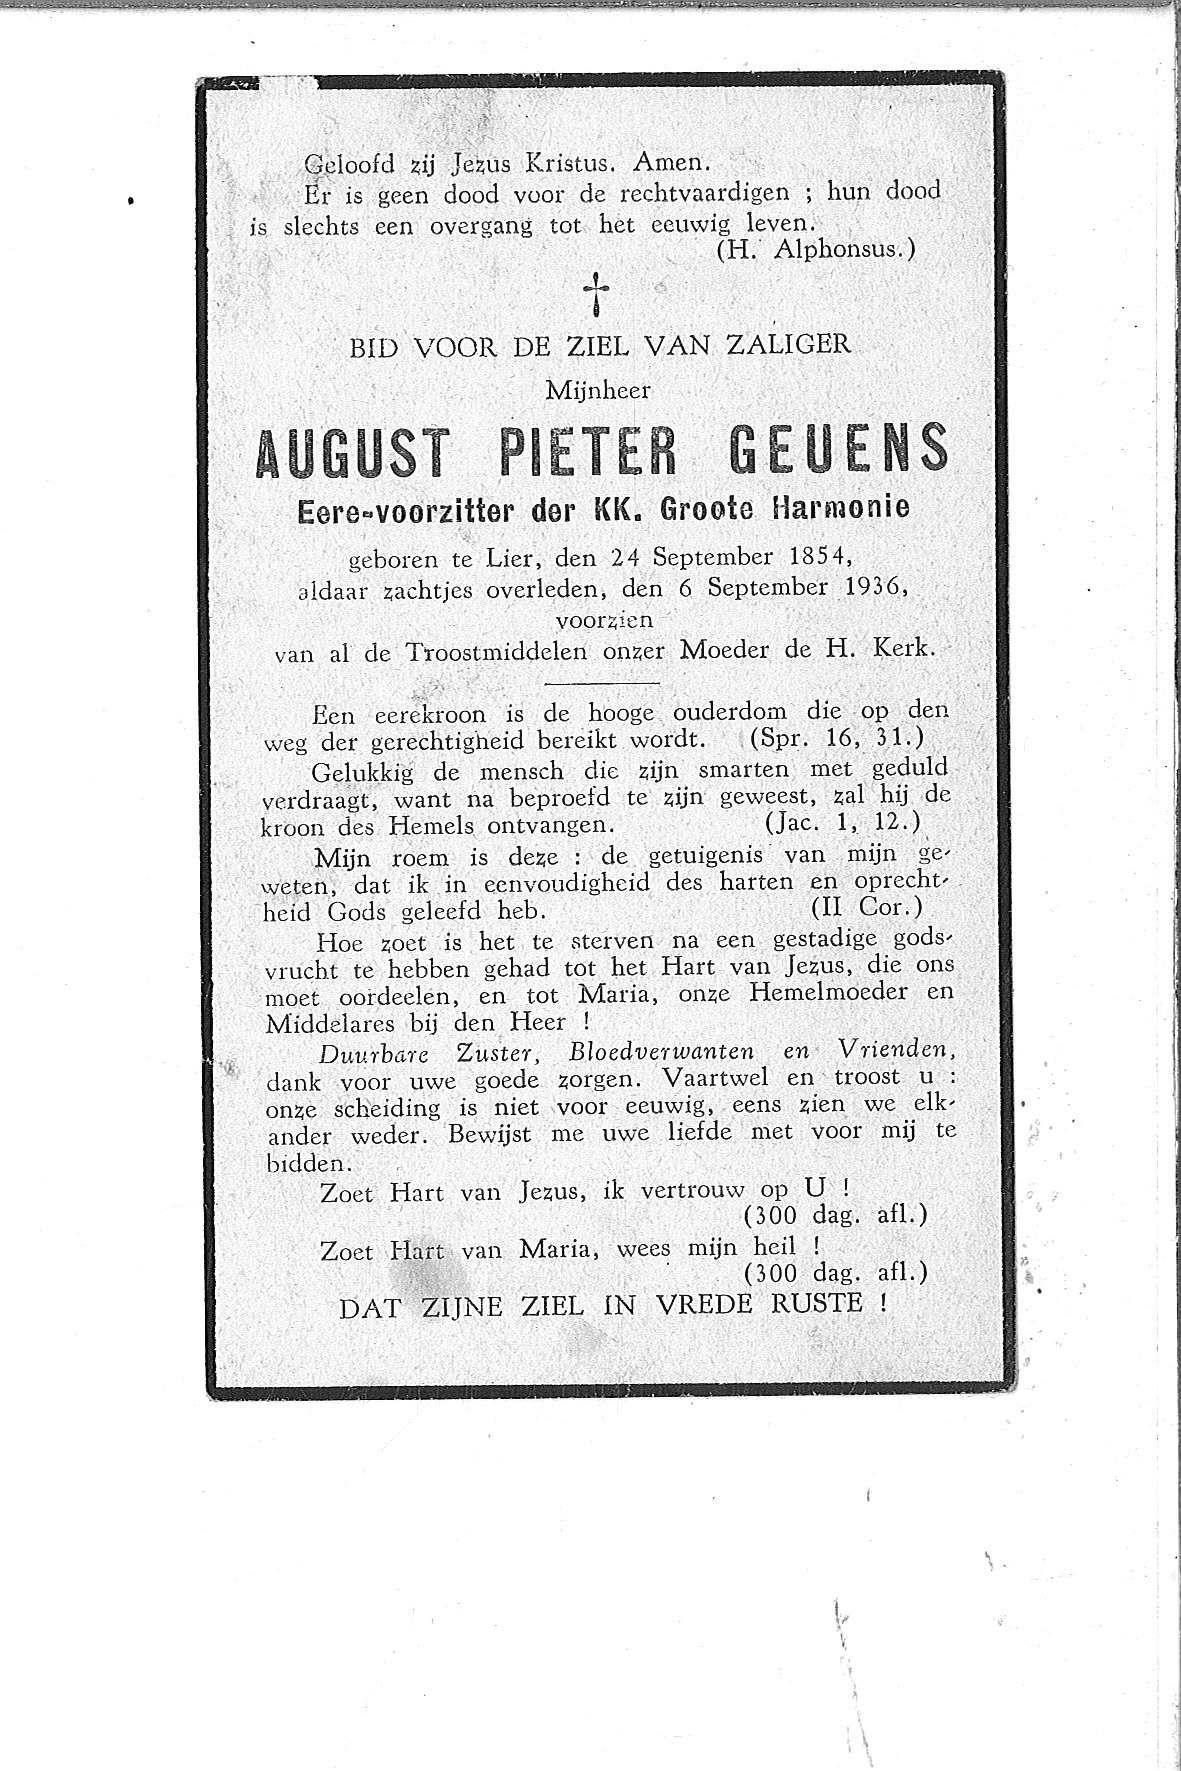 August - Pieter (1936)20131210144048_00007.jpg